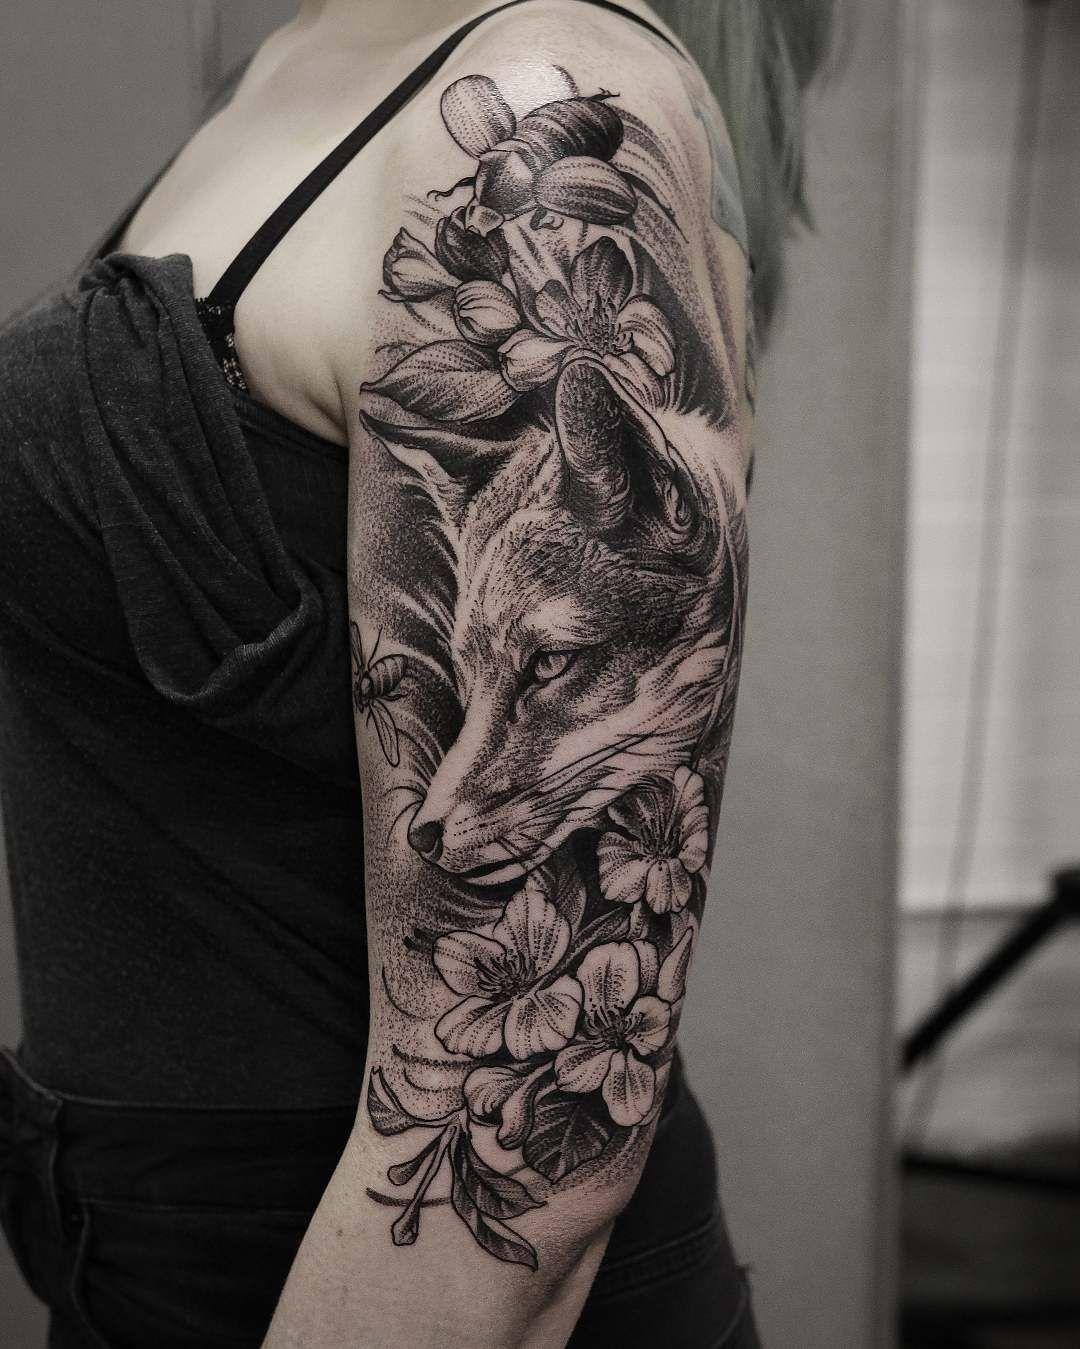 dotwork fox tattoo on halfsleeve tattoo ideas pinterest foxes tattoo and tatting. Black Bedroom Furniture Sets. Home Design Ideas